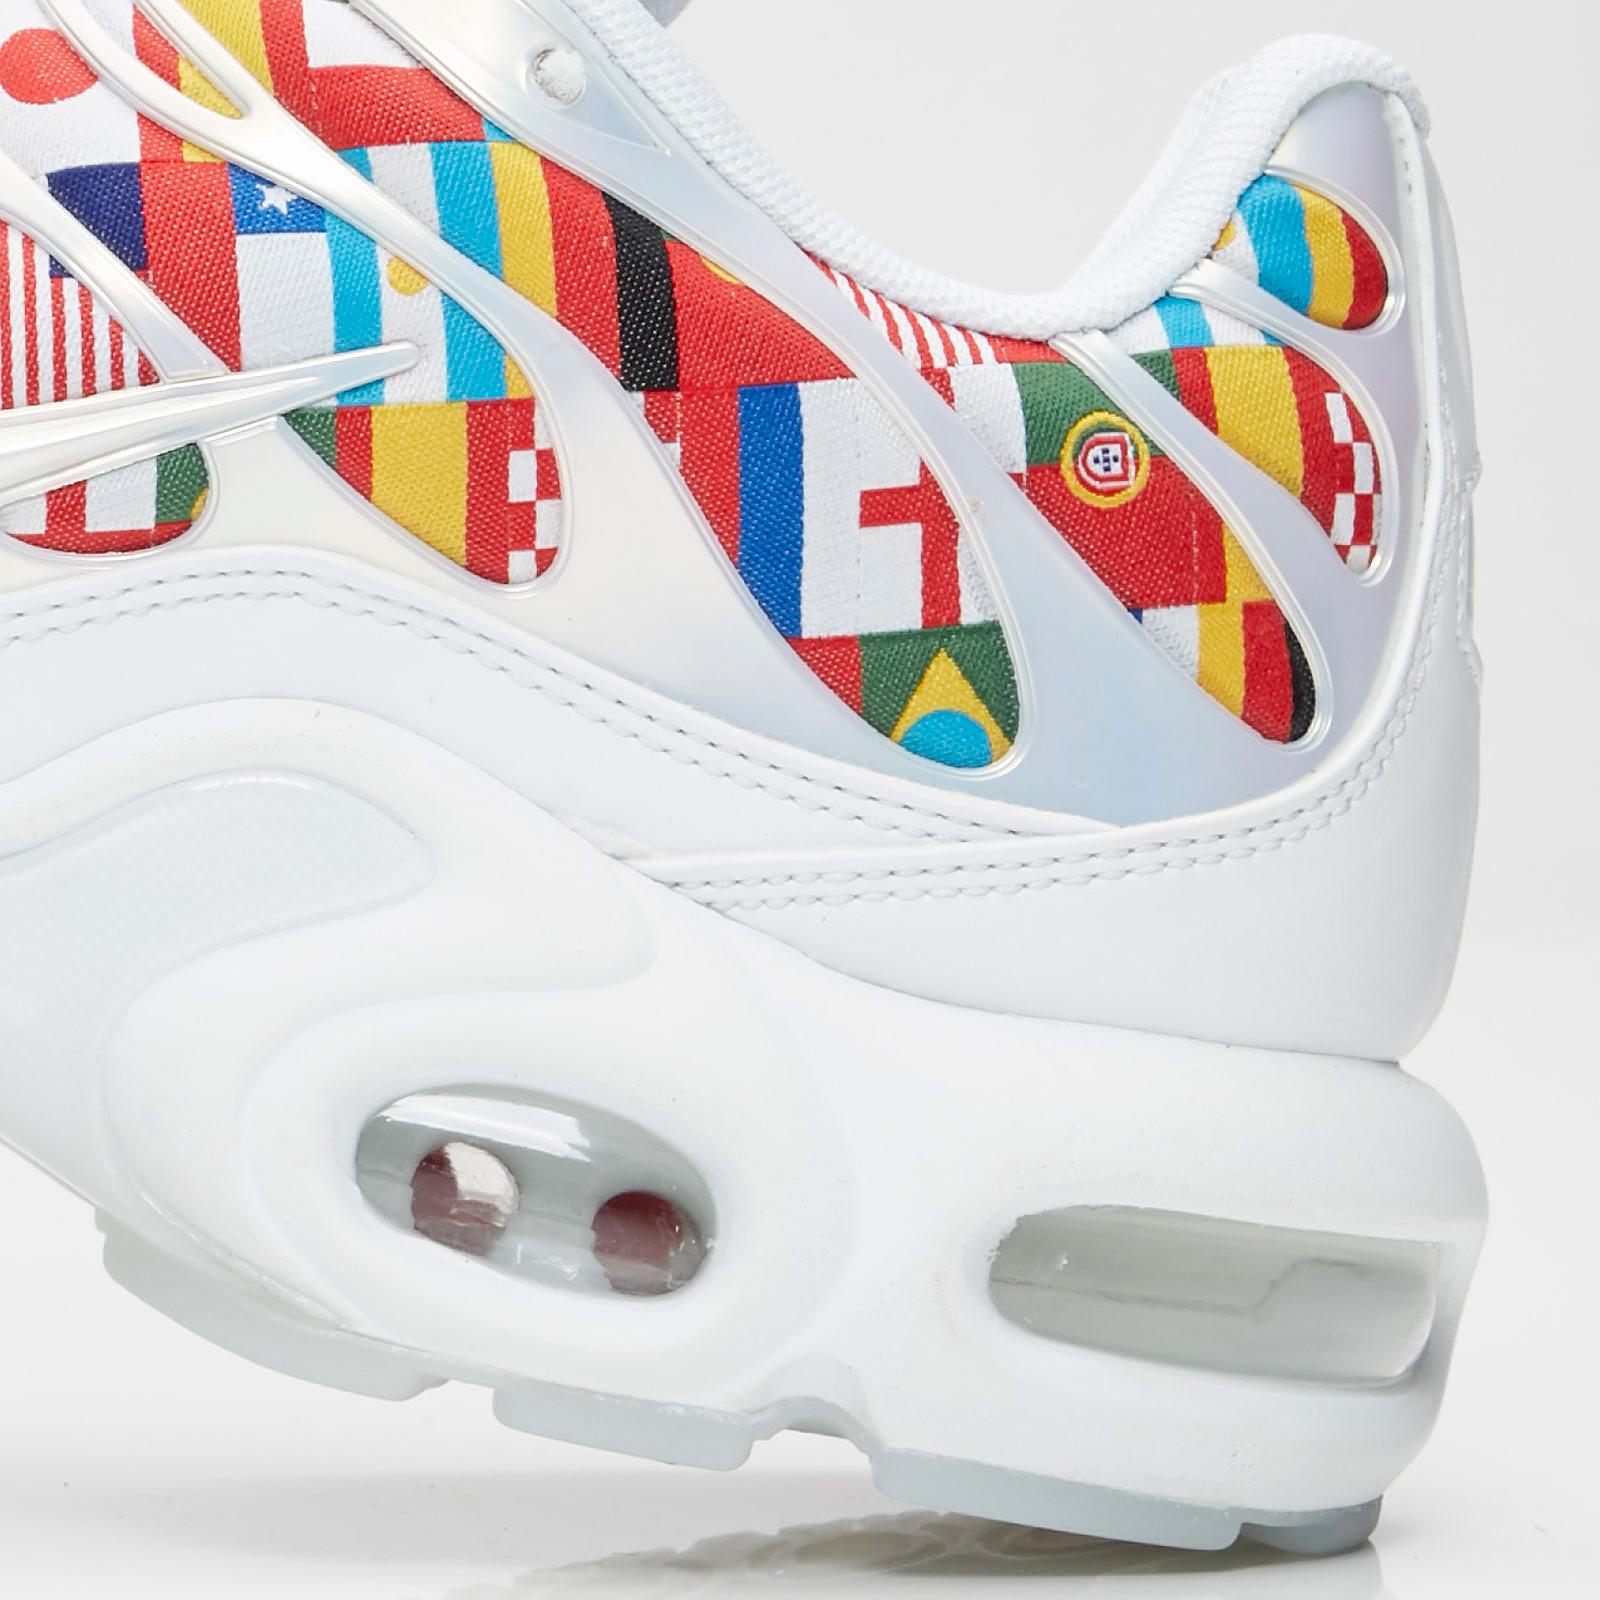 faa83b5d7e Nike Air Max Plus NIC QS - Ao5117-100 - Sneakersnstuff   sneakers ...